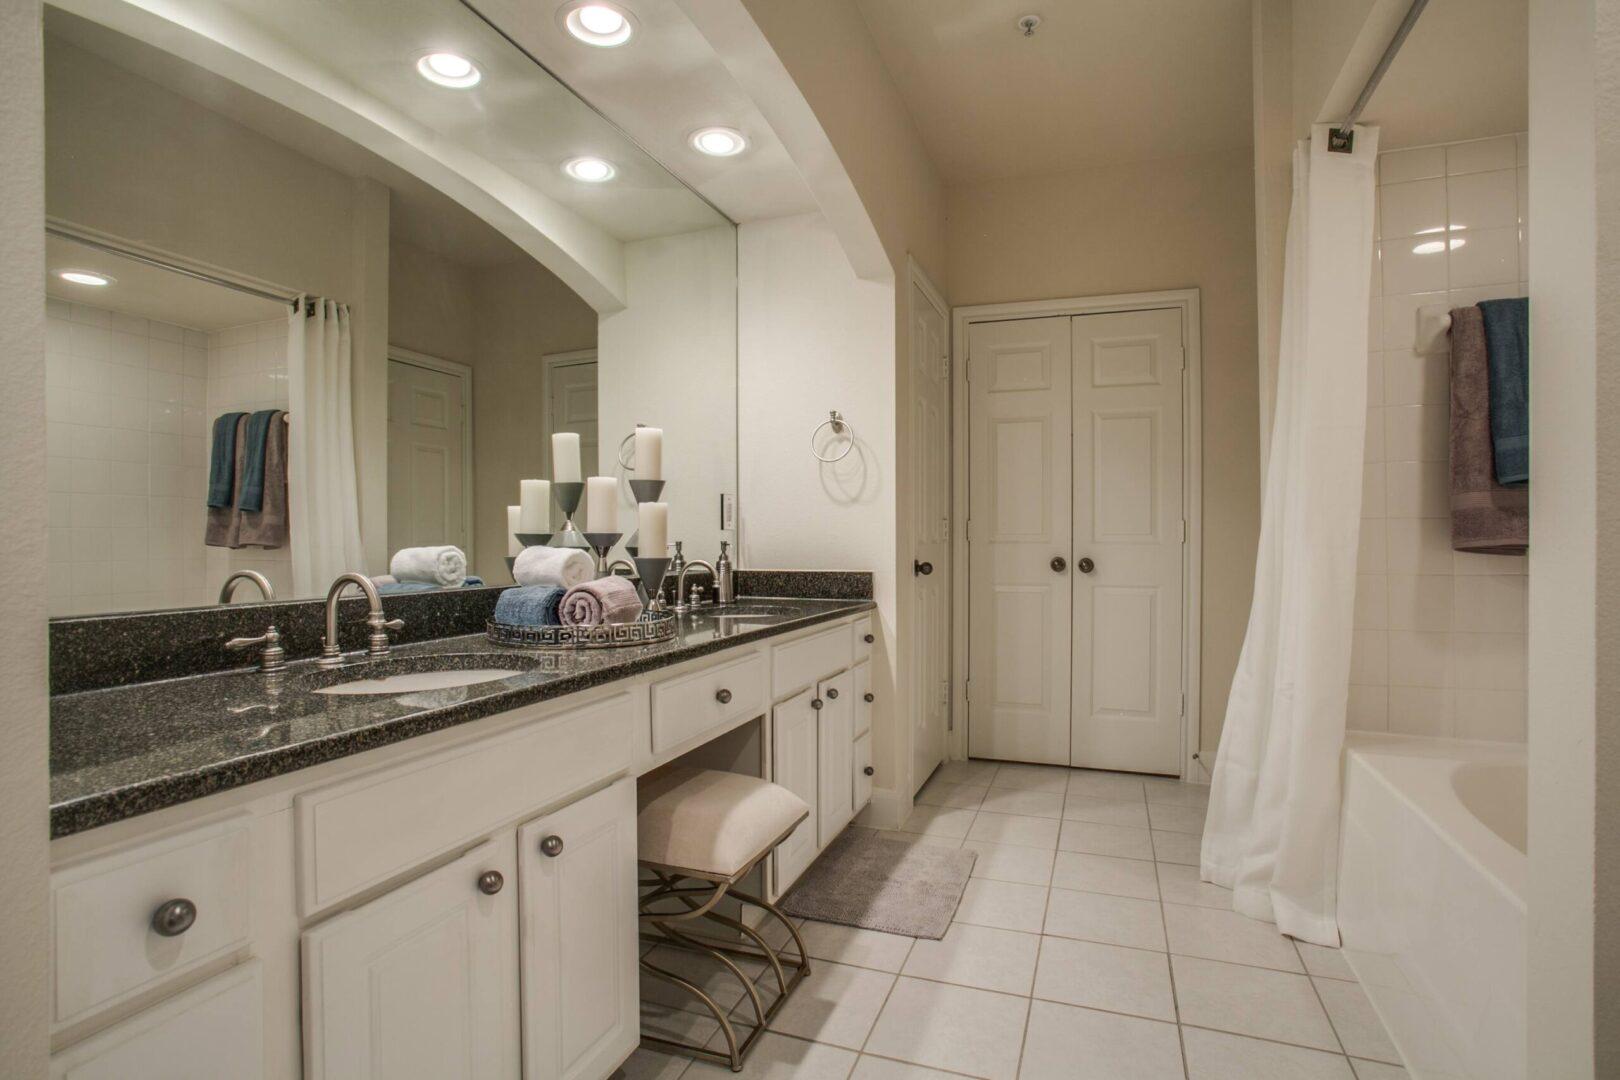 luxury apartments in preston hollow